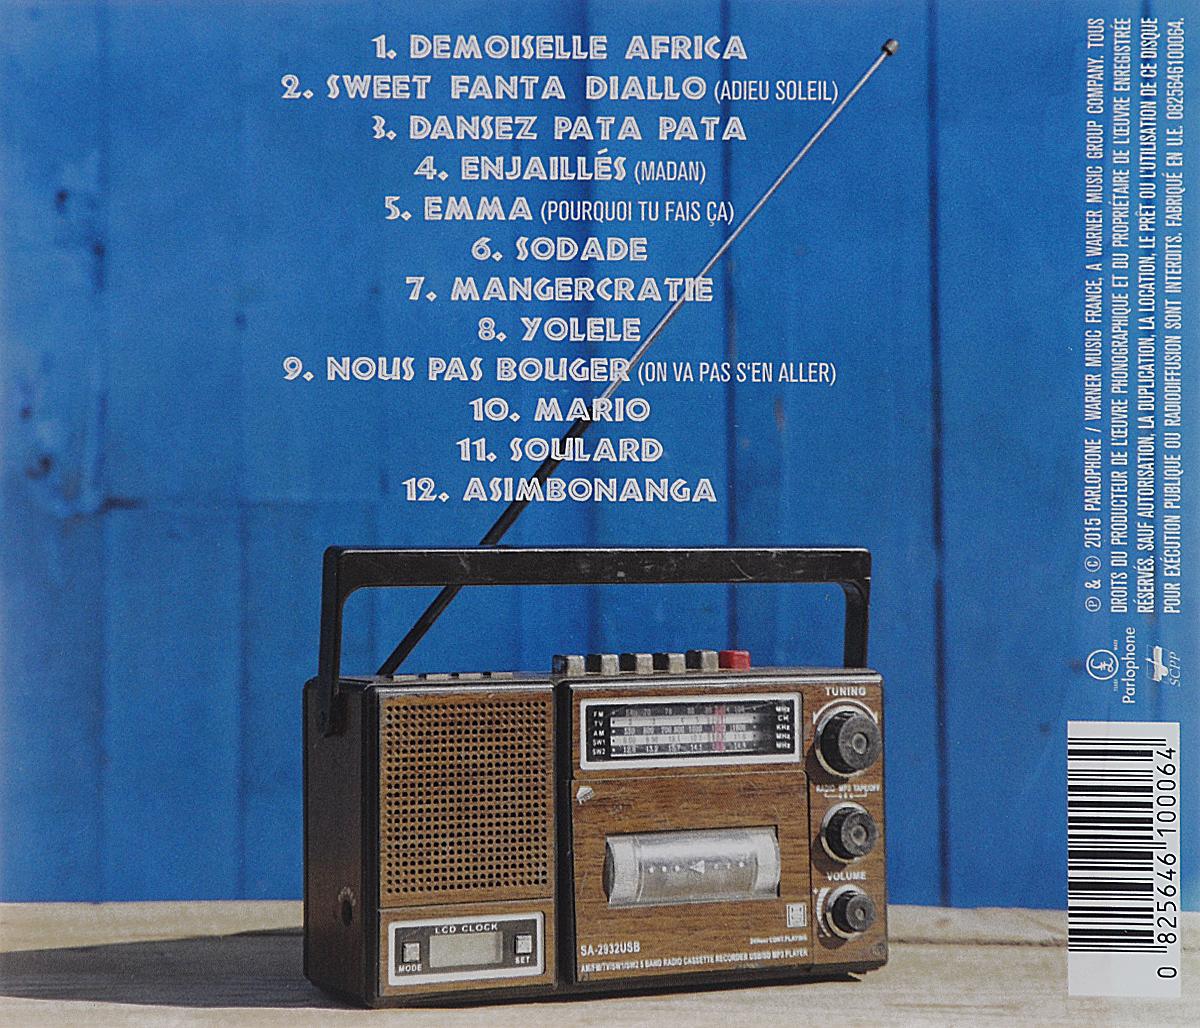 Magic System. Radio Afrika